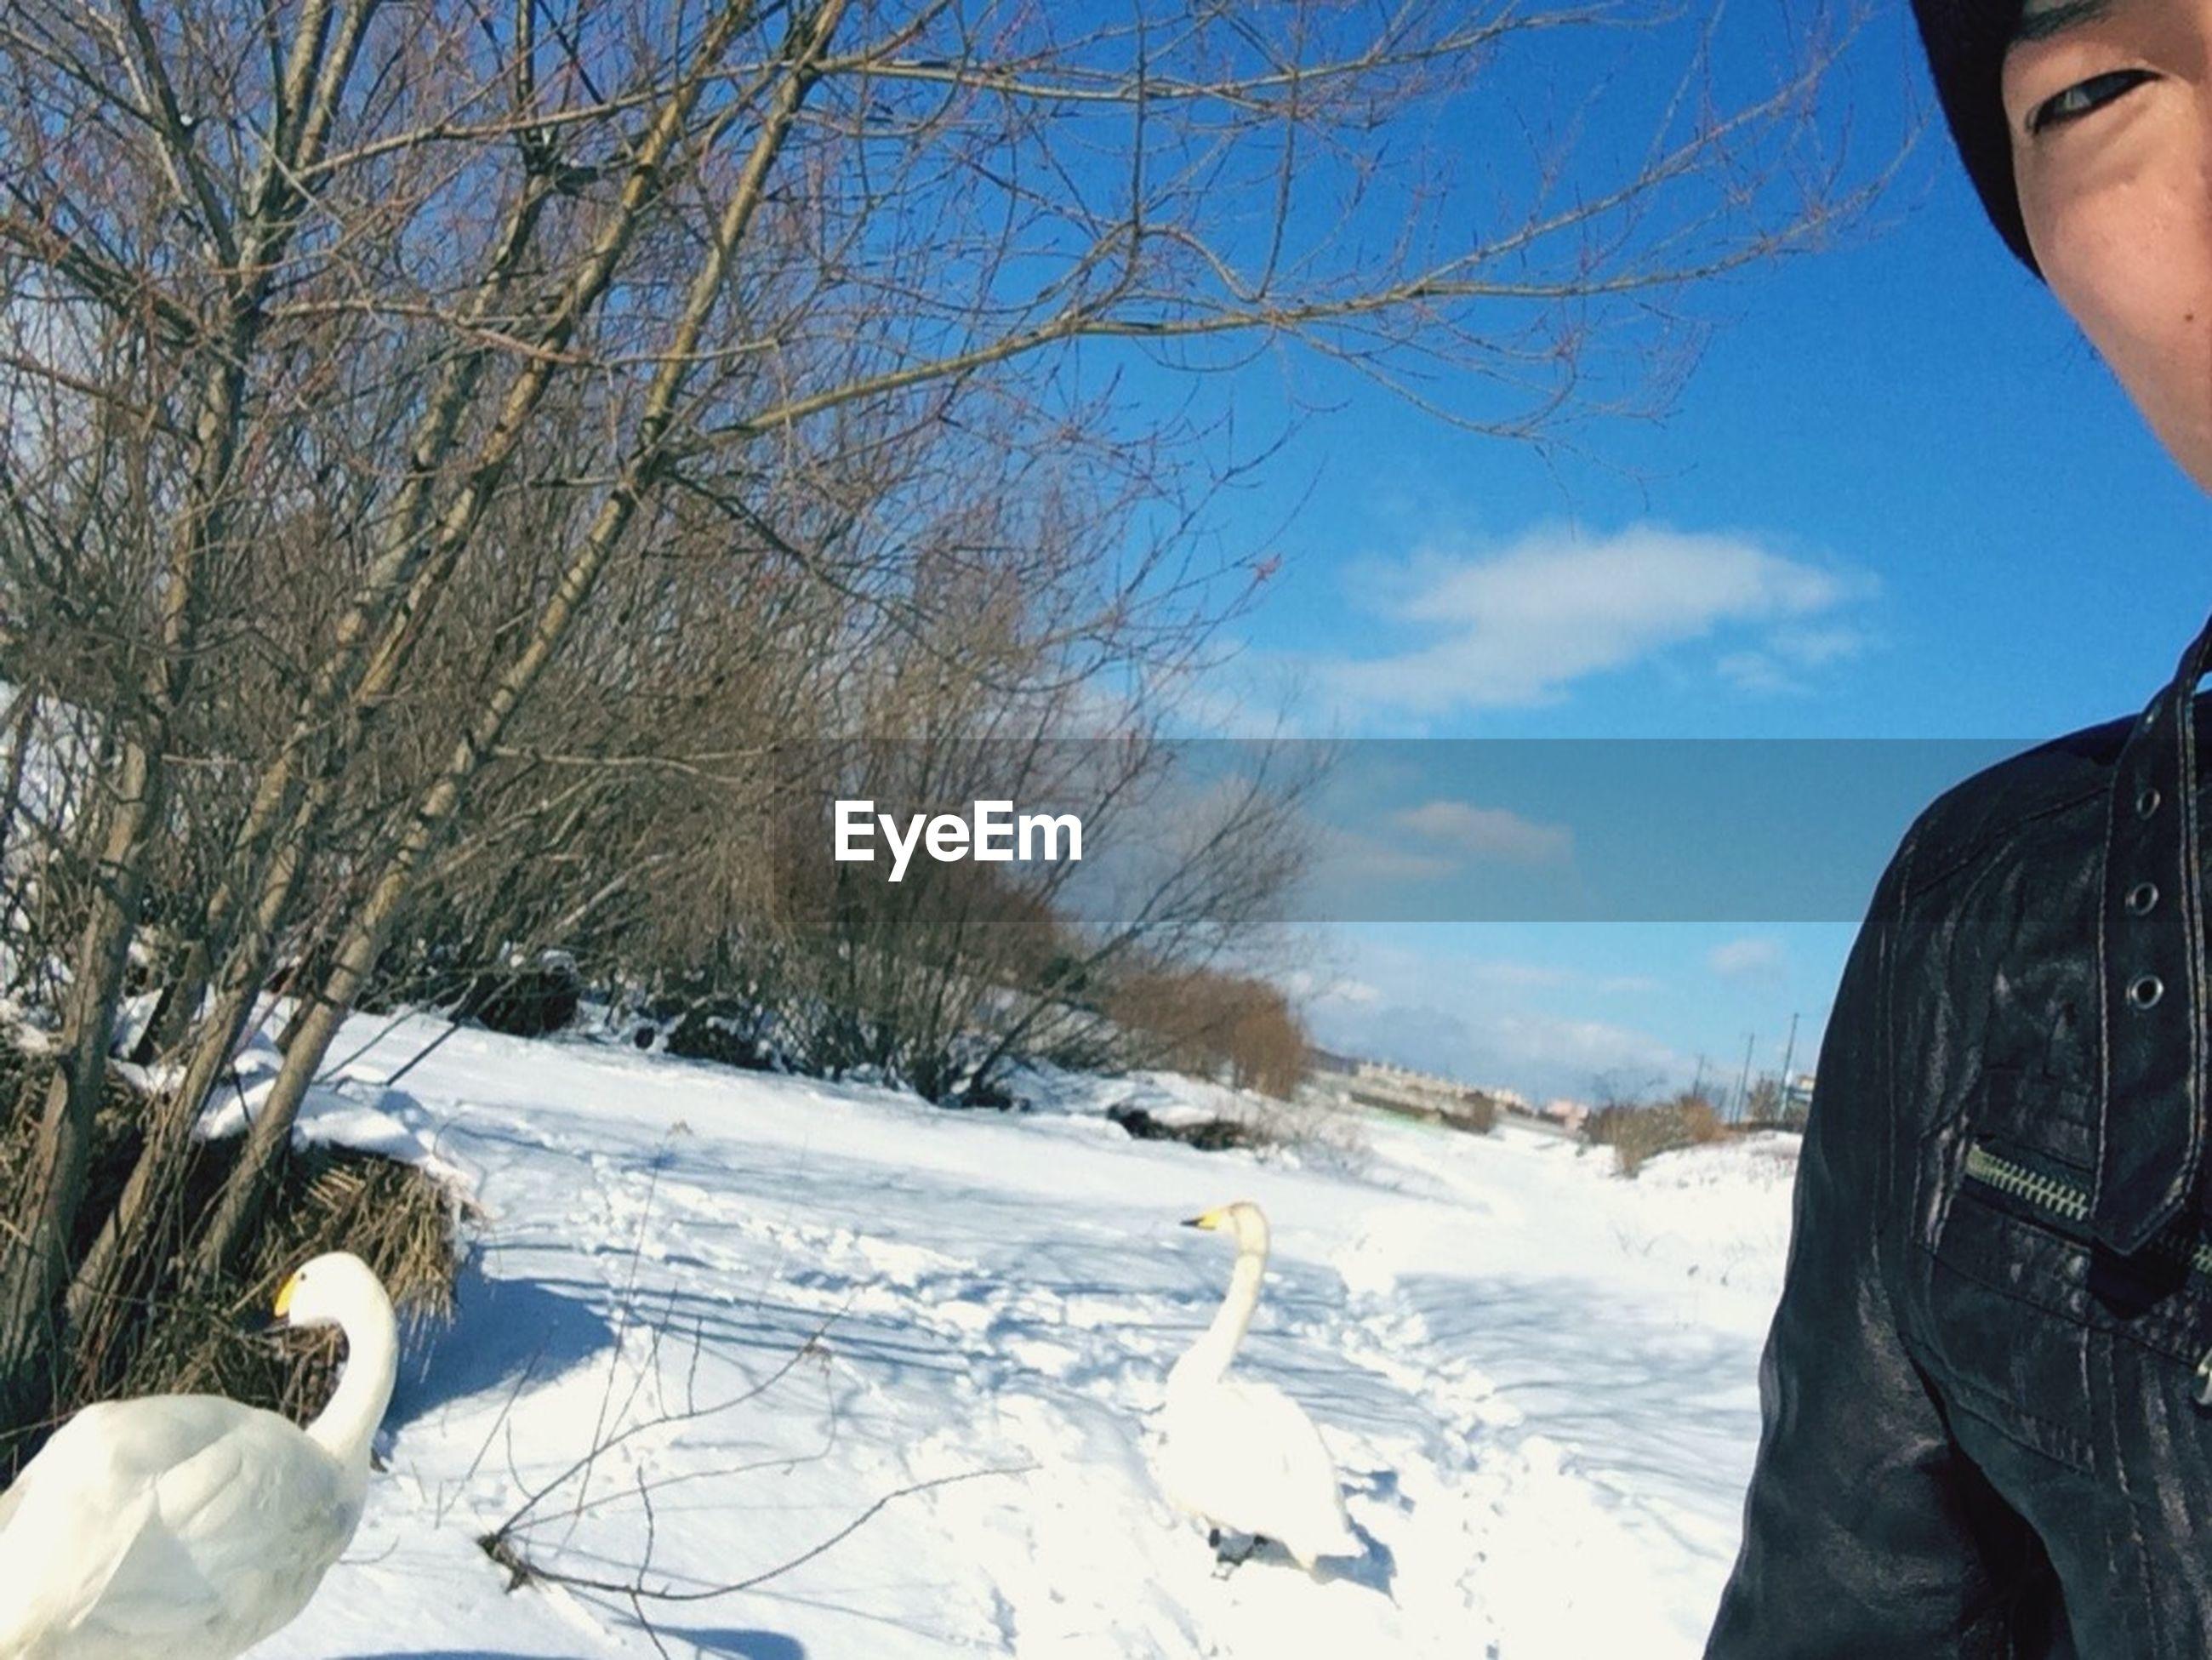 snow, cold temperature, winter, season, frozen, part of, person, bare tree, tree, weather, unrecognizable person, sky, lifestyles, cropped, leisure activity, white color, nature